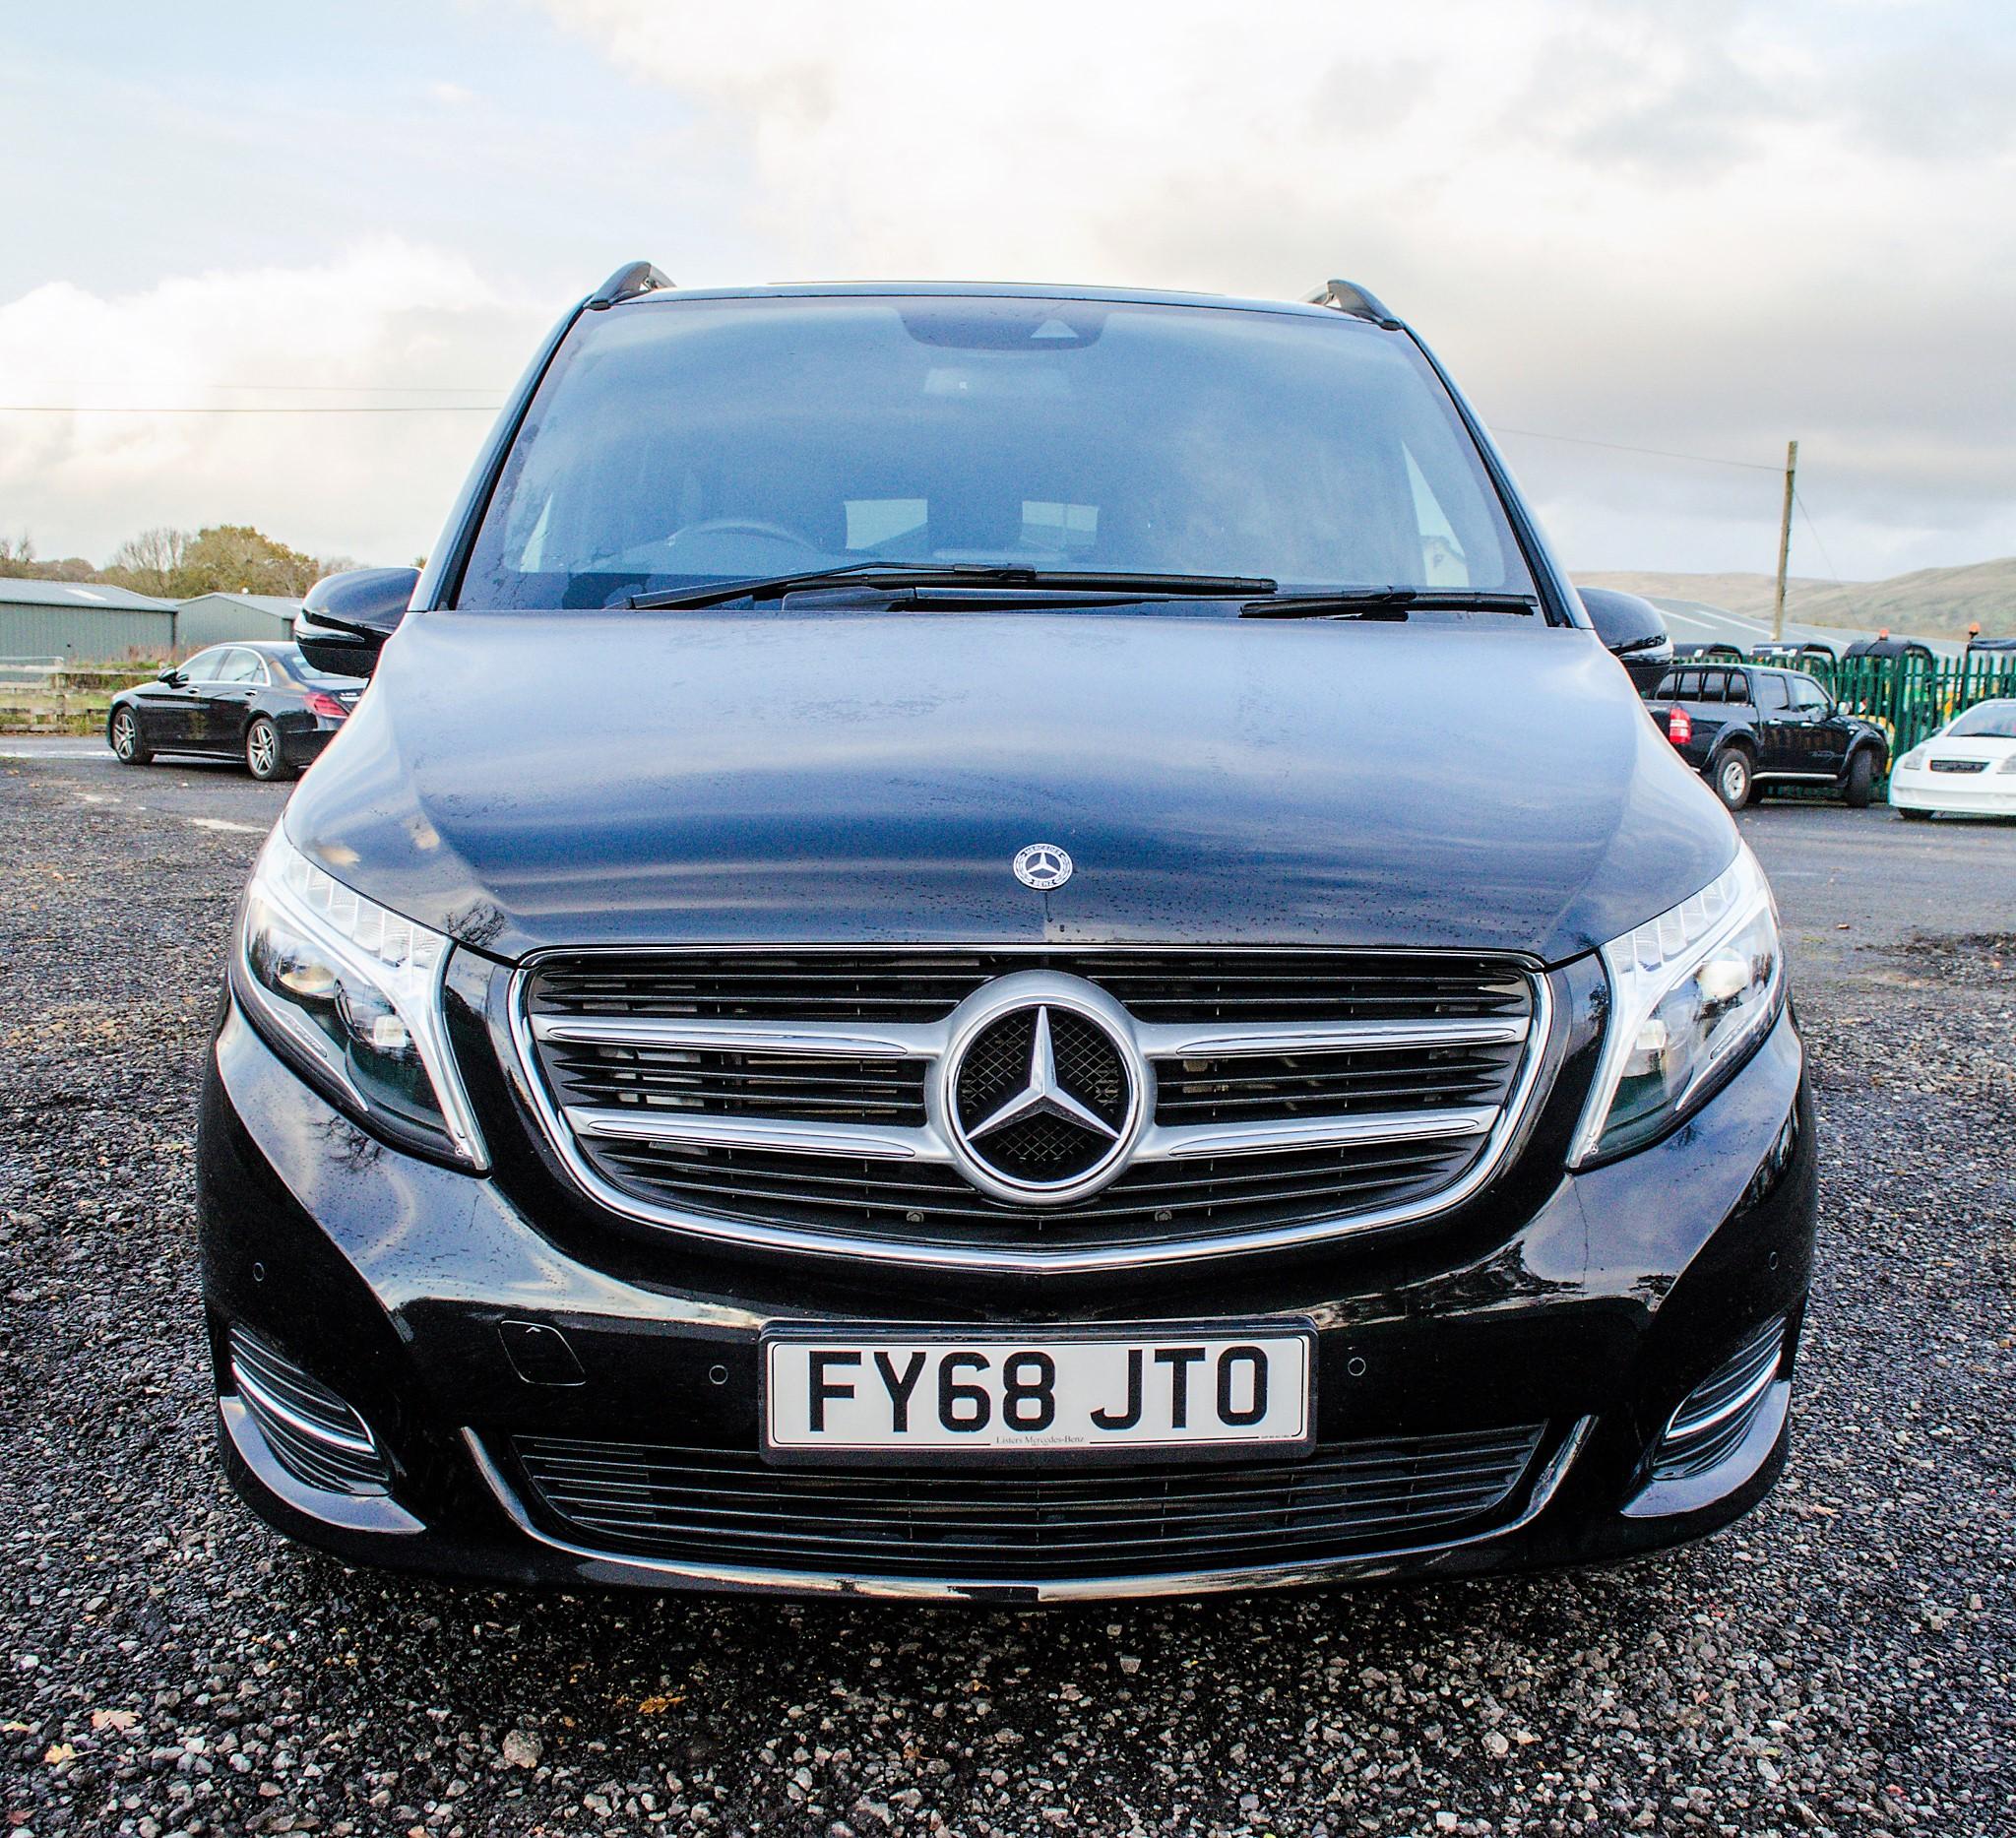 Mercedes Benz V250 Sport Bluetec XLWB auto diesel 8 seat MPV Reg No: FY68 JTO Date of First - Image 5 of 27